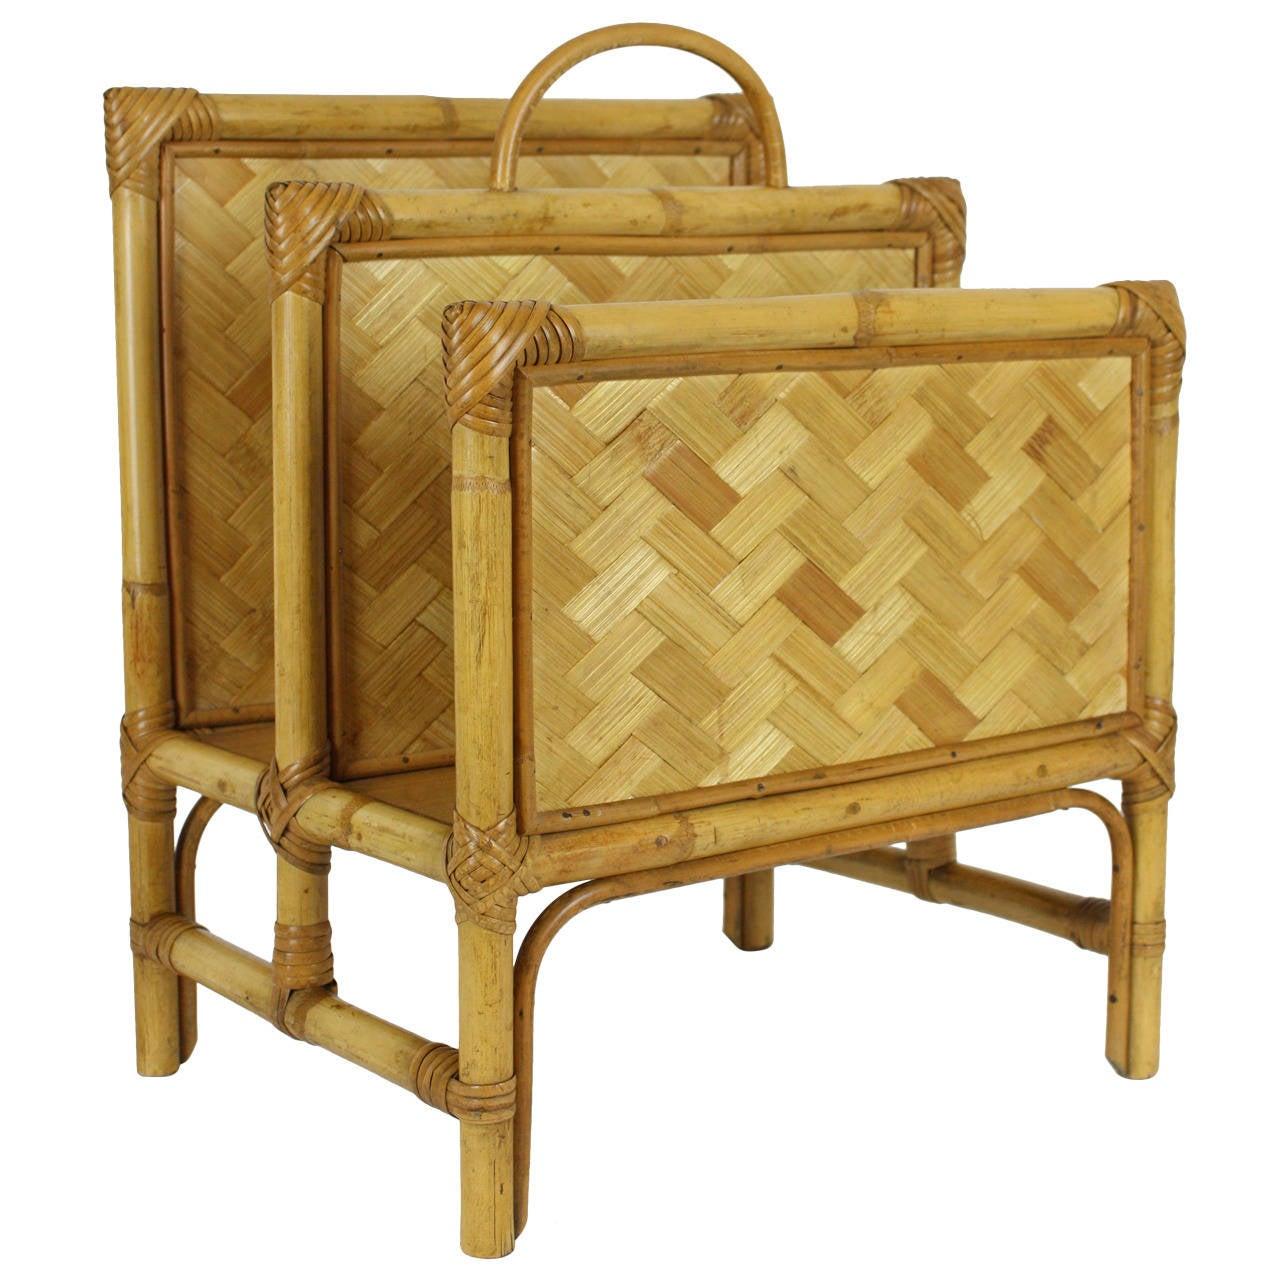 Towel Rack In Spanish: Spanish Mid-20th Century Woven Bamboo Magazine Rack For